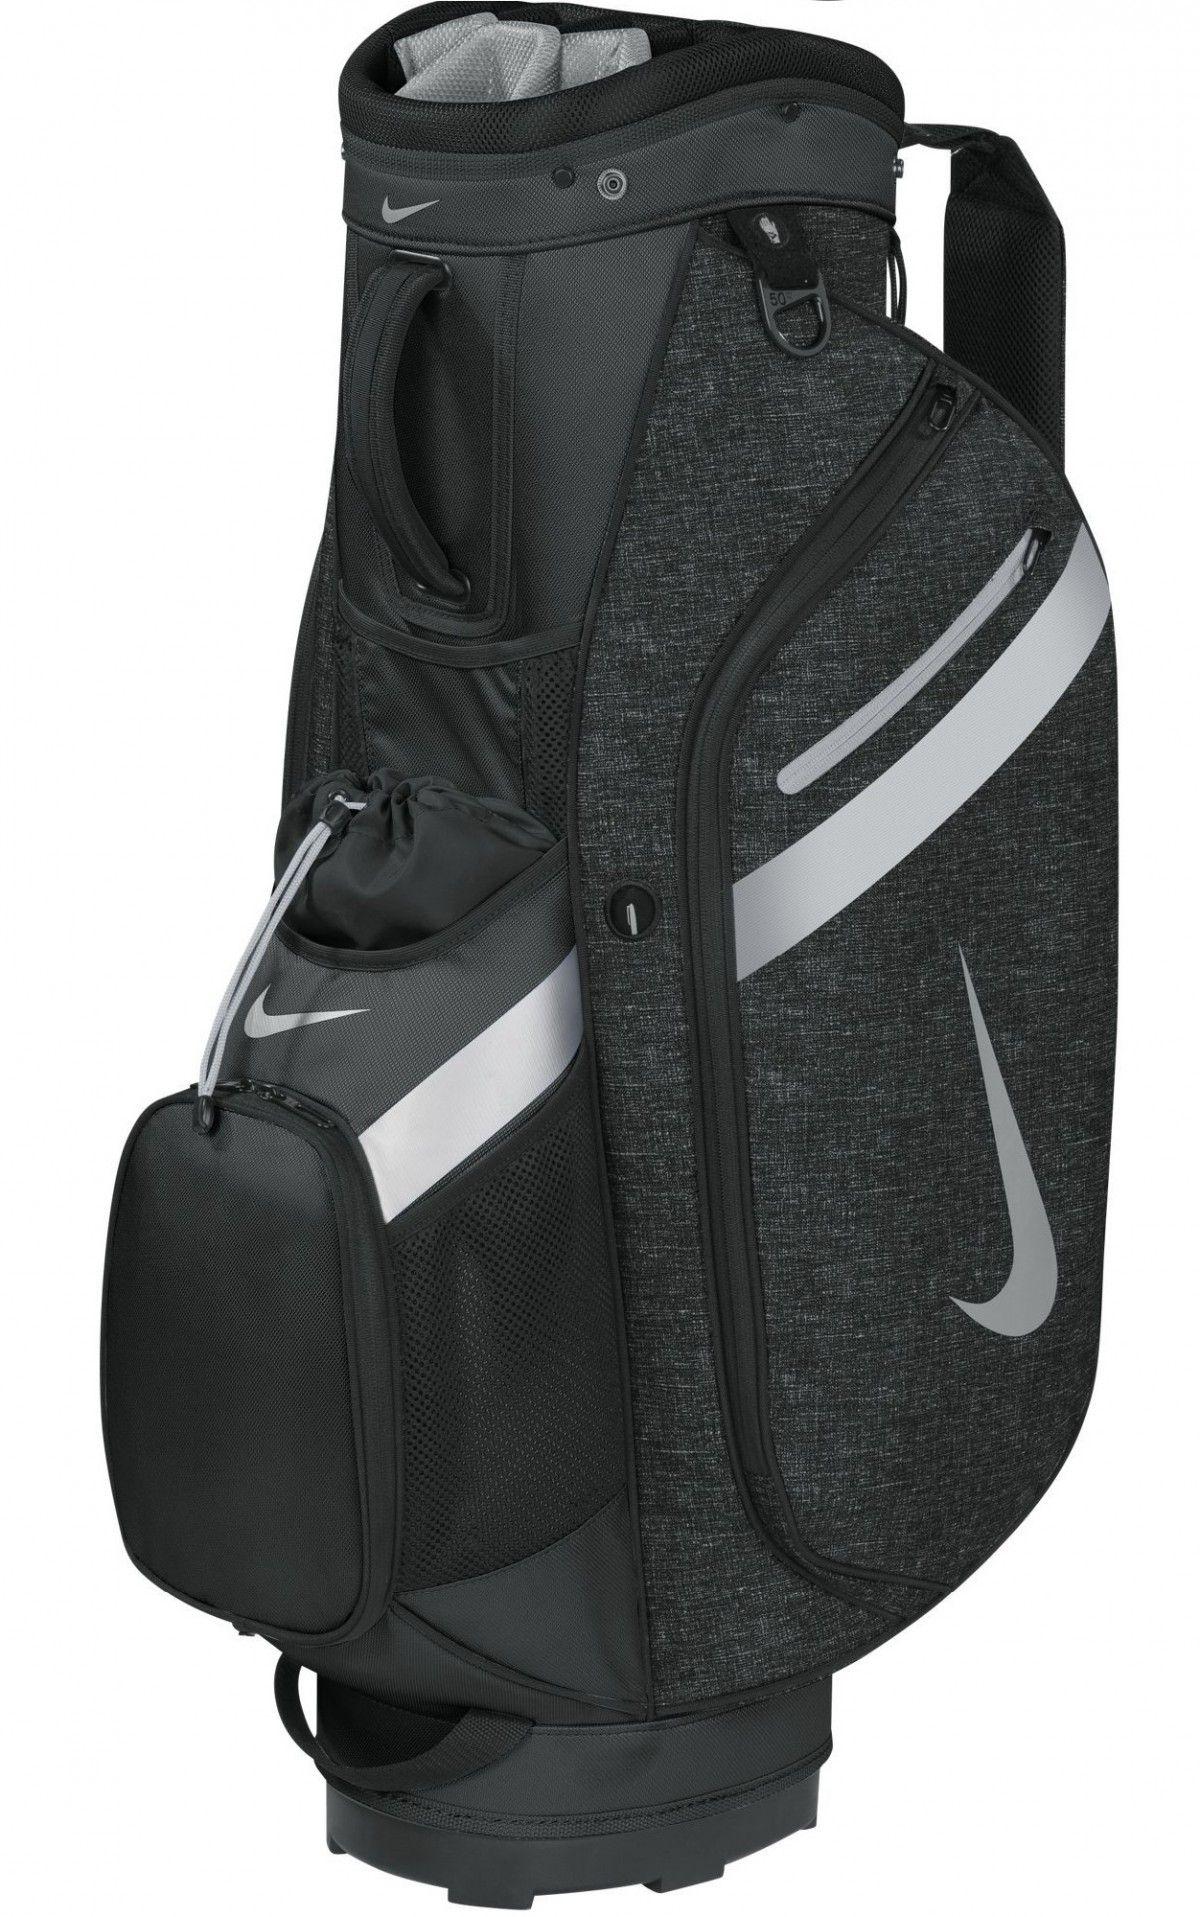 Estado colisión oscuro  Nike Sport IV Cart Bag 2016 Golf & Ski Warehouse   Golf bags, Womens golf  wear, Golf wear